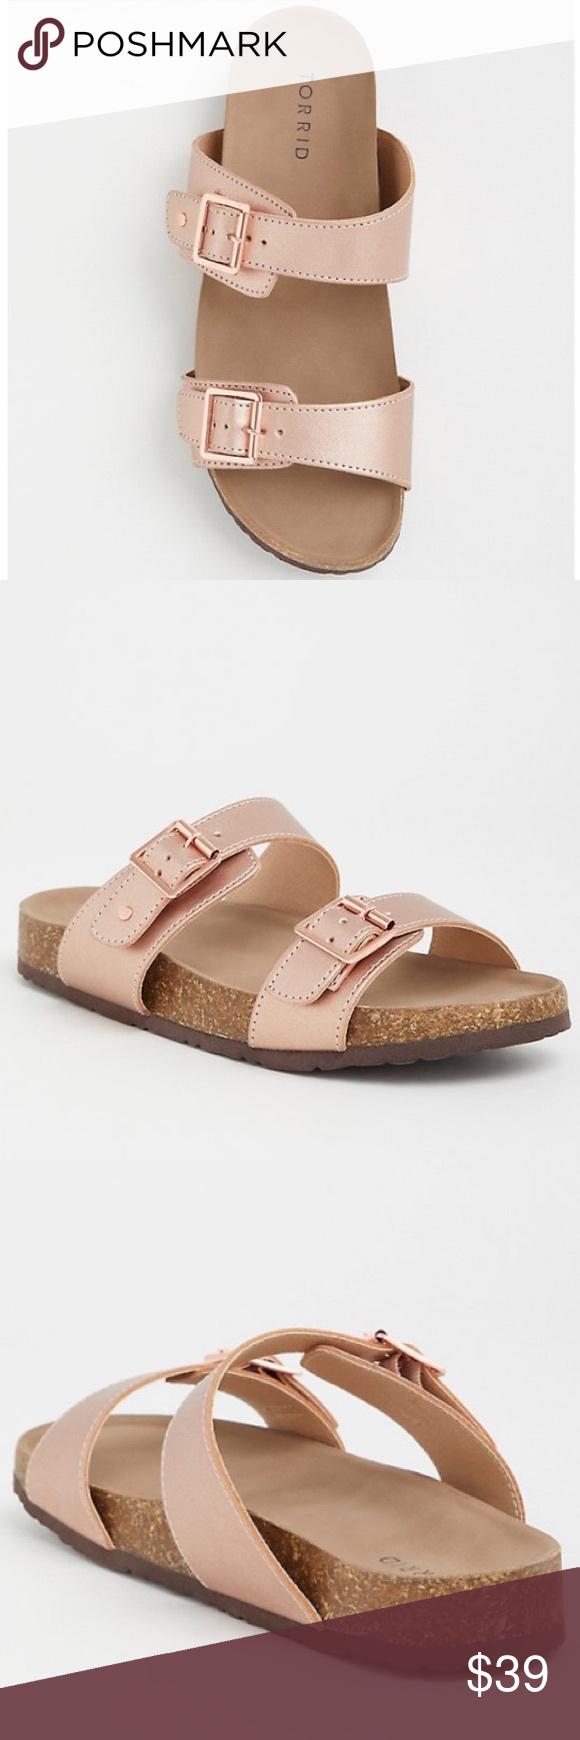 b9755cb2612a NWT Torrid boho rose gold slip on slide sandals 11 Brand new with tags